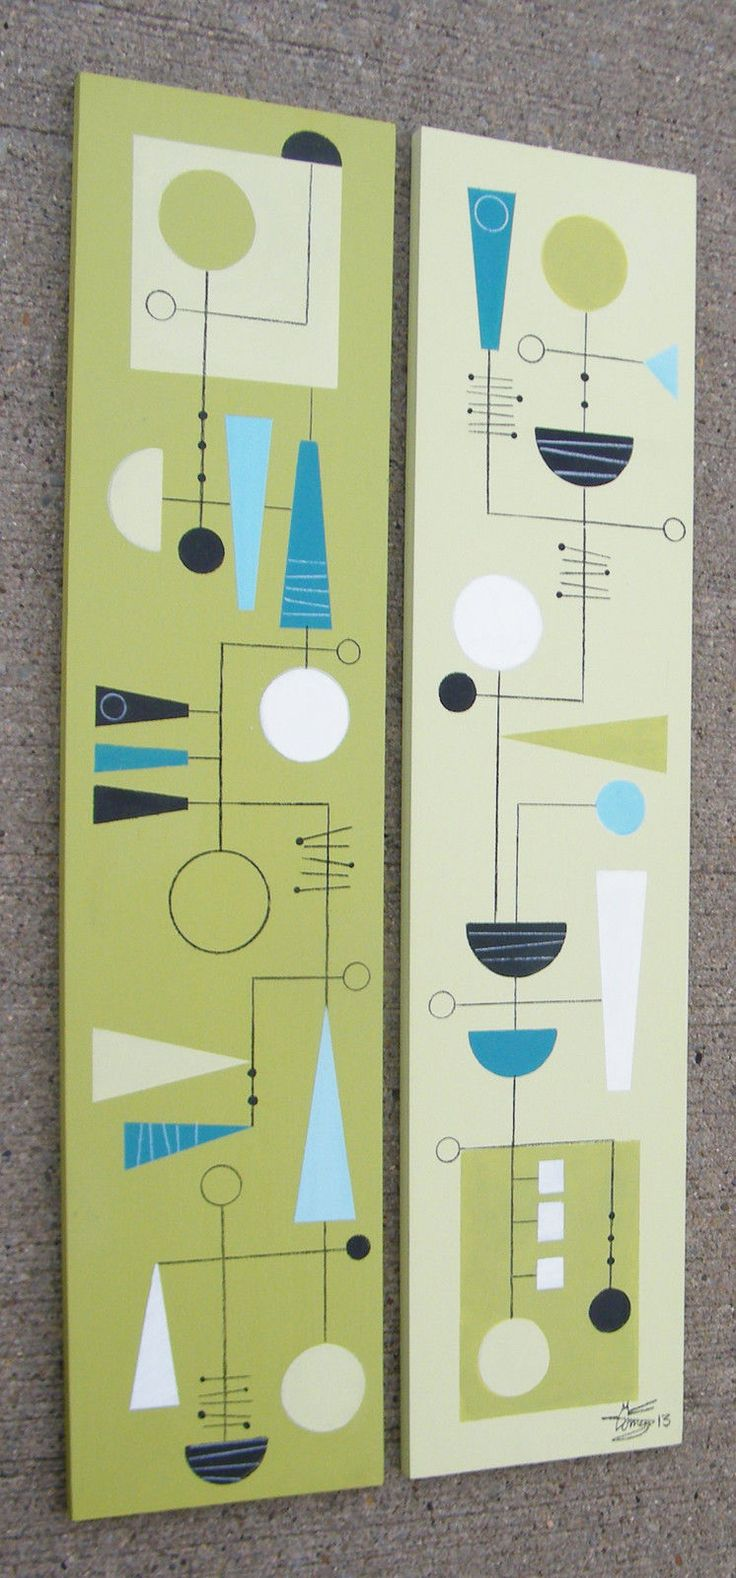 2 El Gato Gomez Paintings Retro Mid Century Modern Abstract Atomic Eames 1950s | eBay..